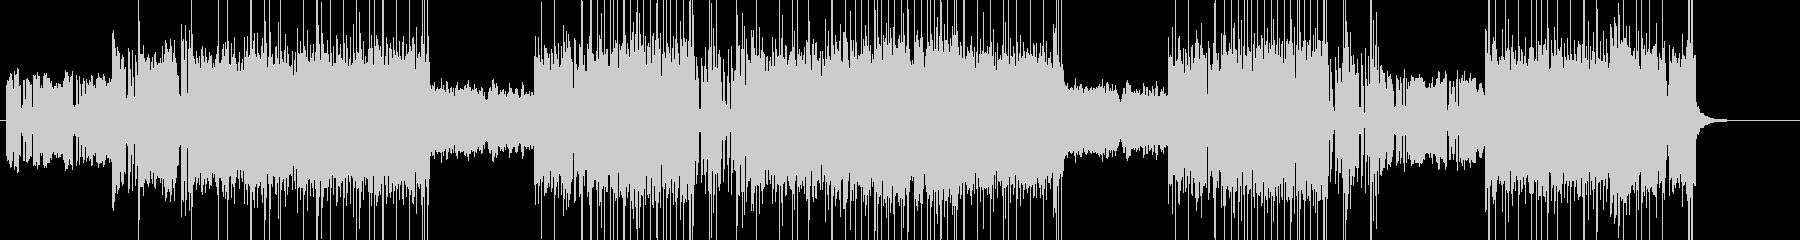 「DARK/ROCK」BGM329の未再生の波形